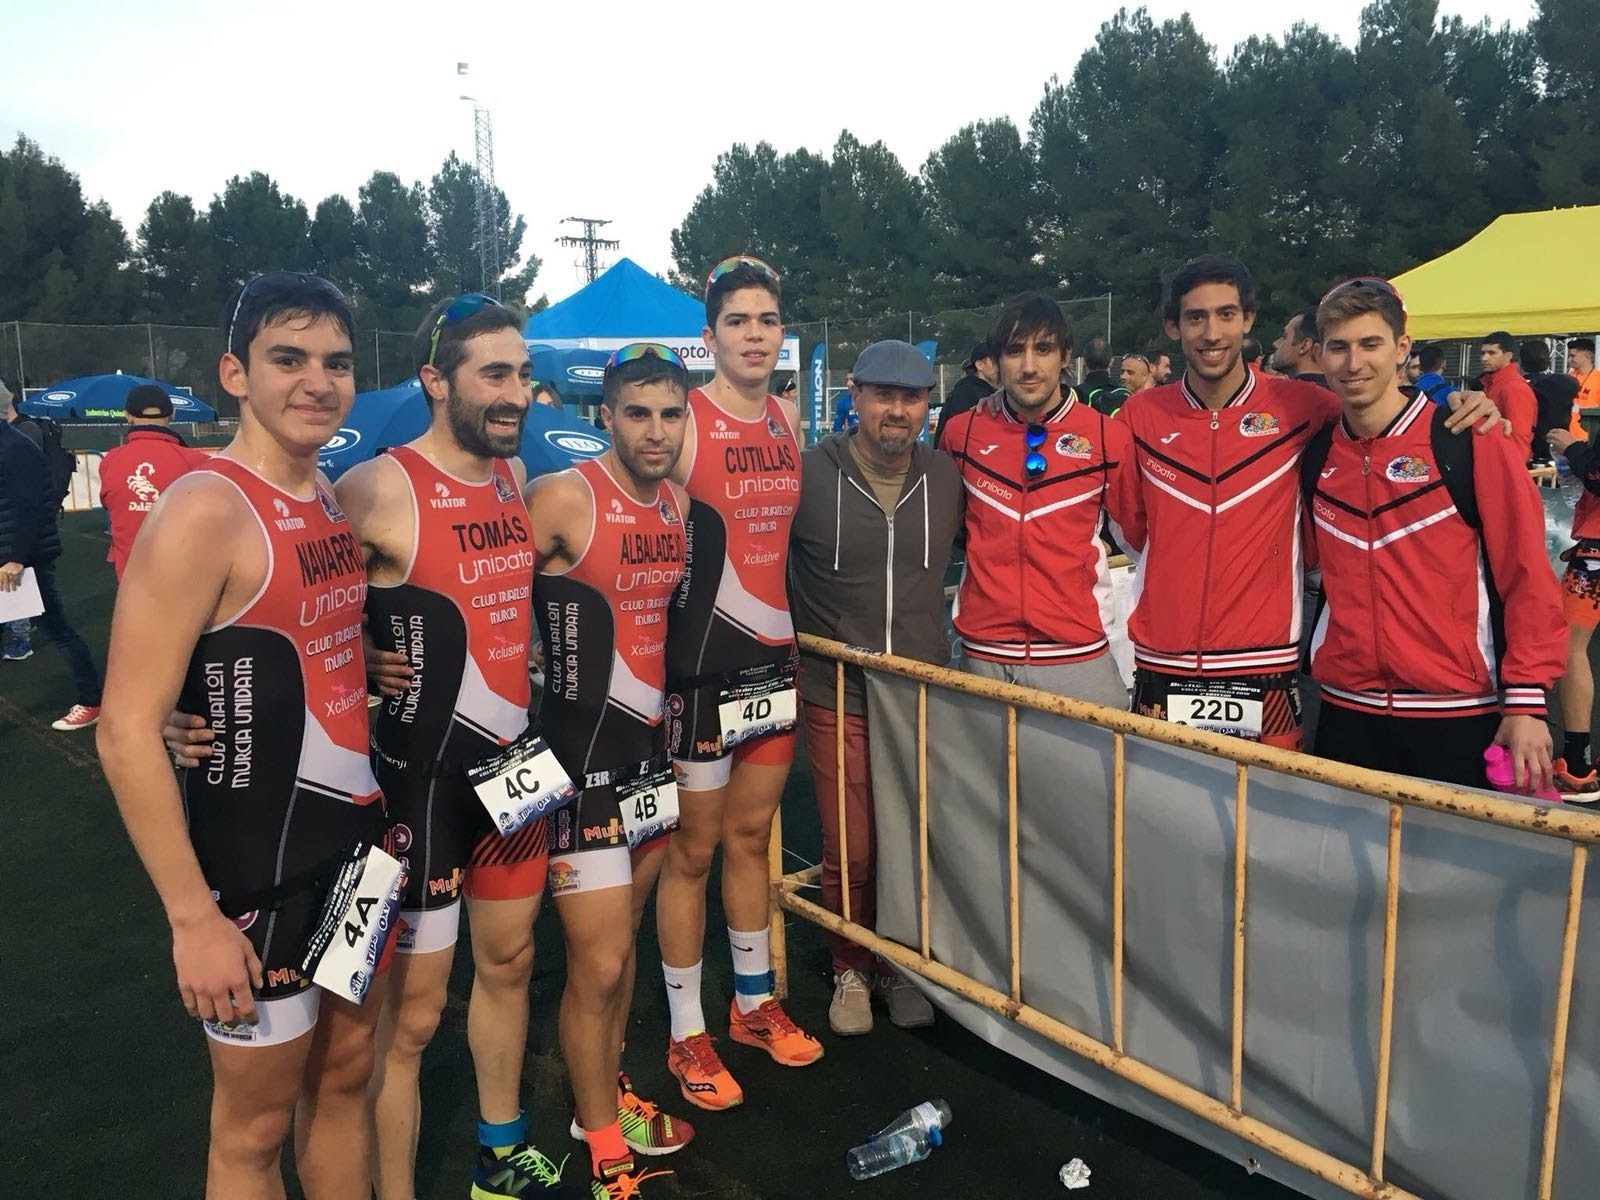 Club_Triatlon_Murcia_Unidata__Campeon_Regional_Duatln_por_Equipos_2018__Triatlon_Murcia_Archena_Femenino_3